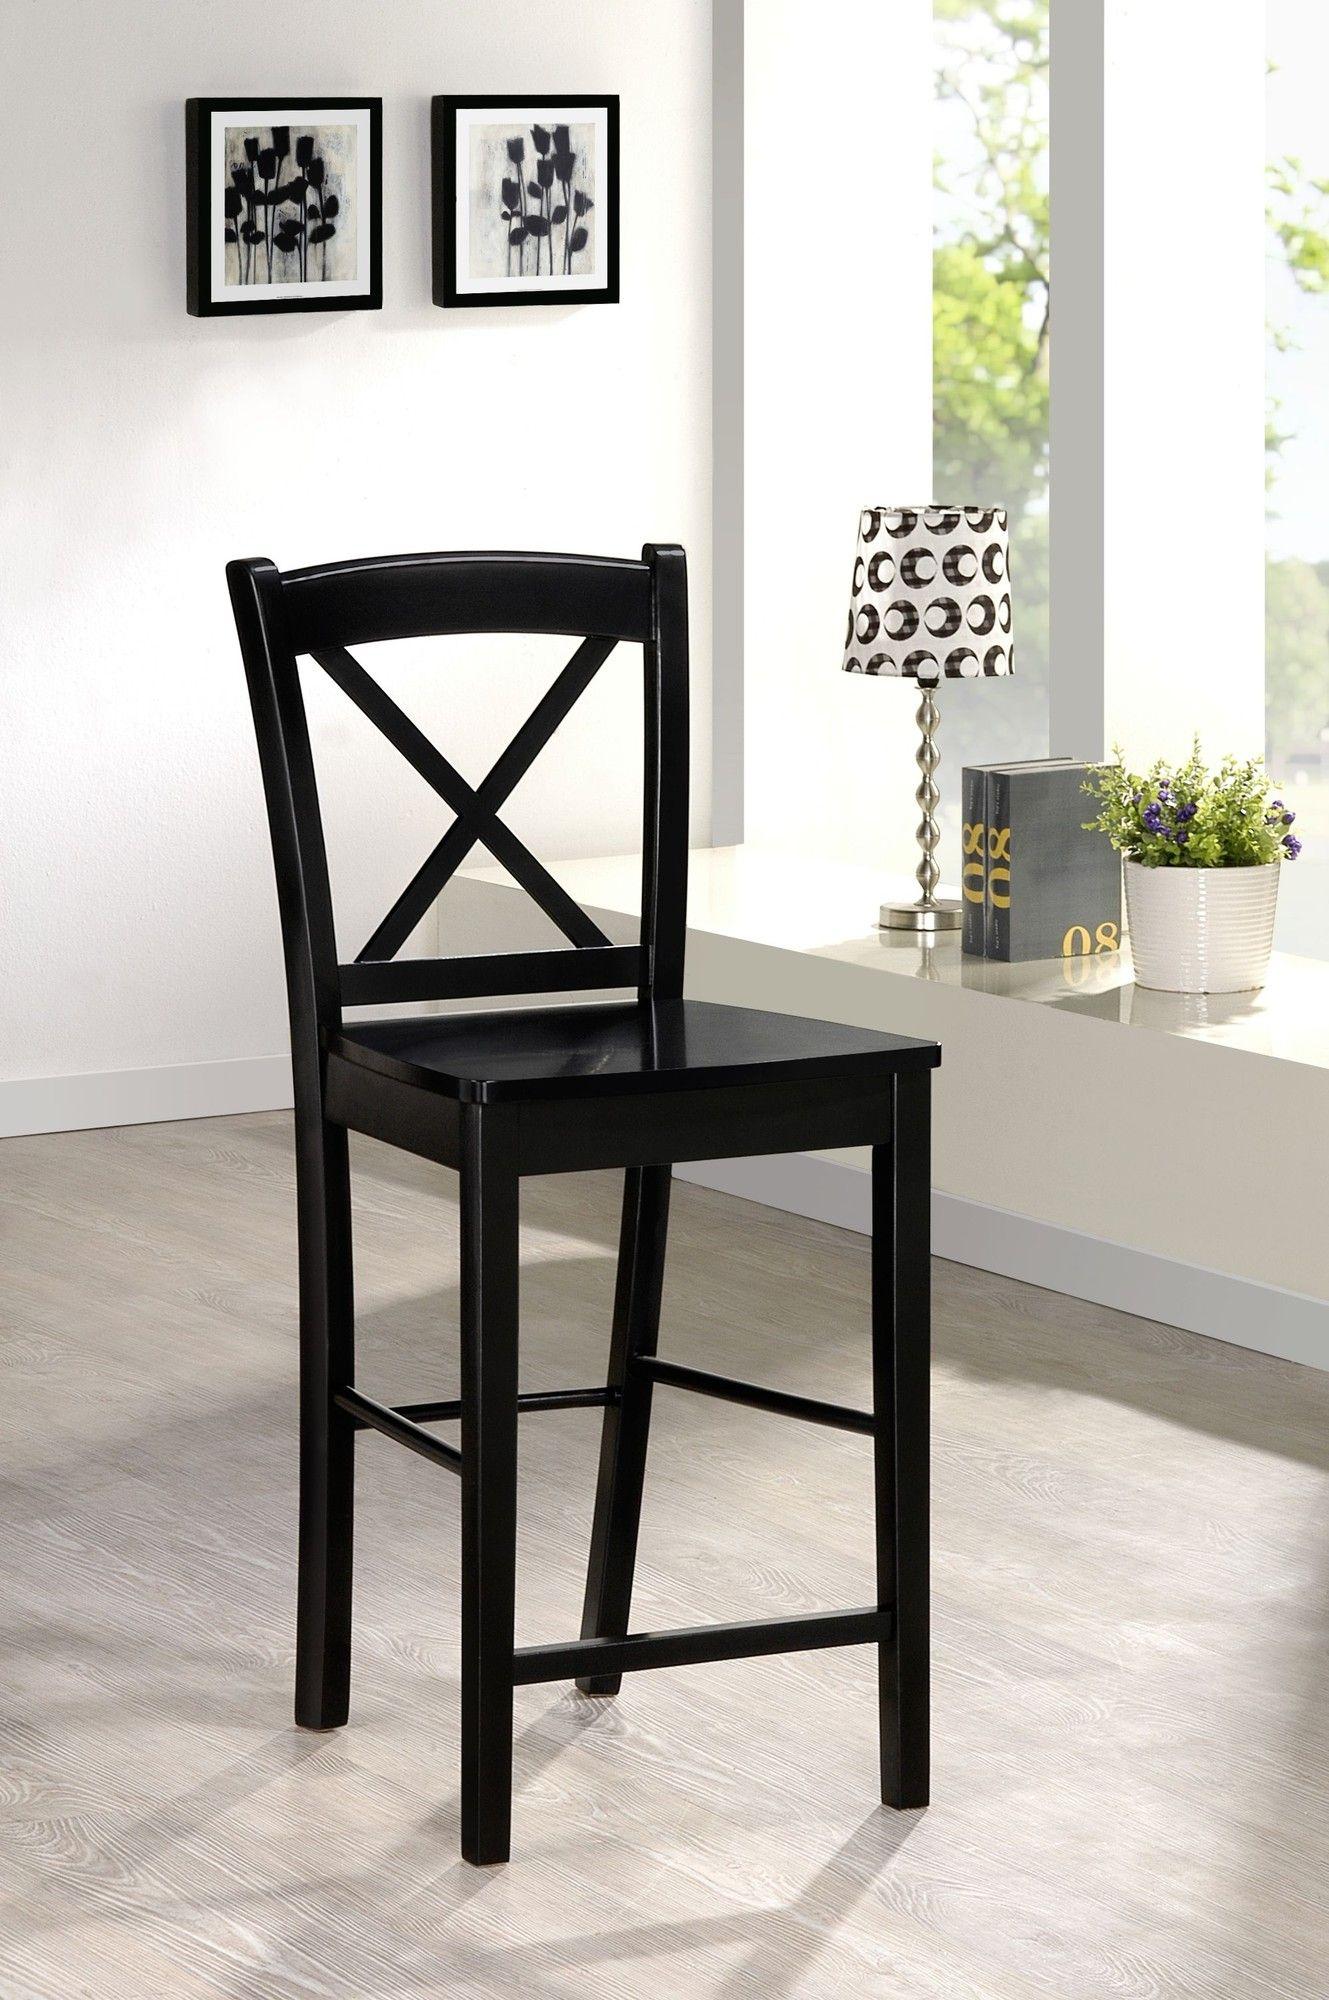 wayfair kitchen stools step stool linon black x bar pinterest 30